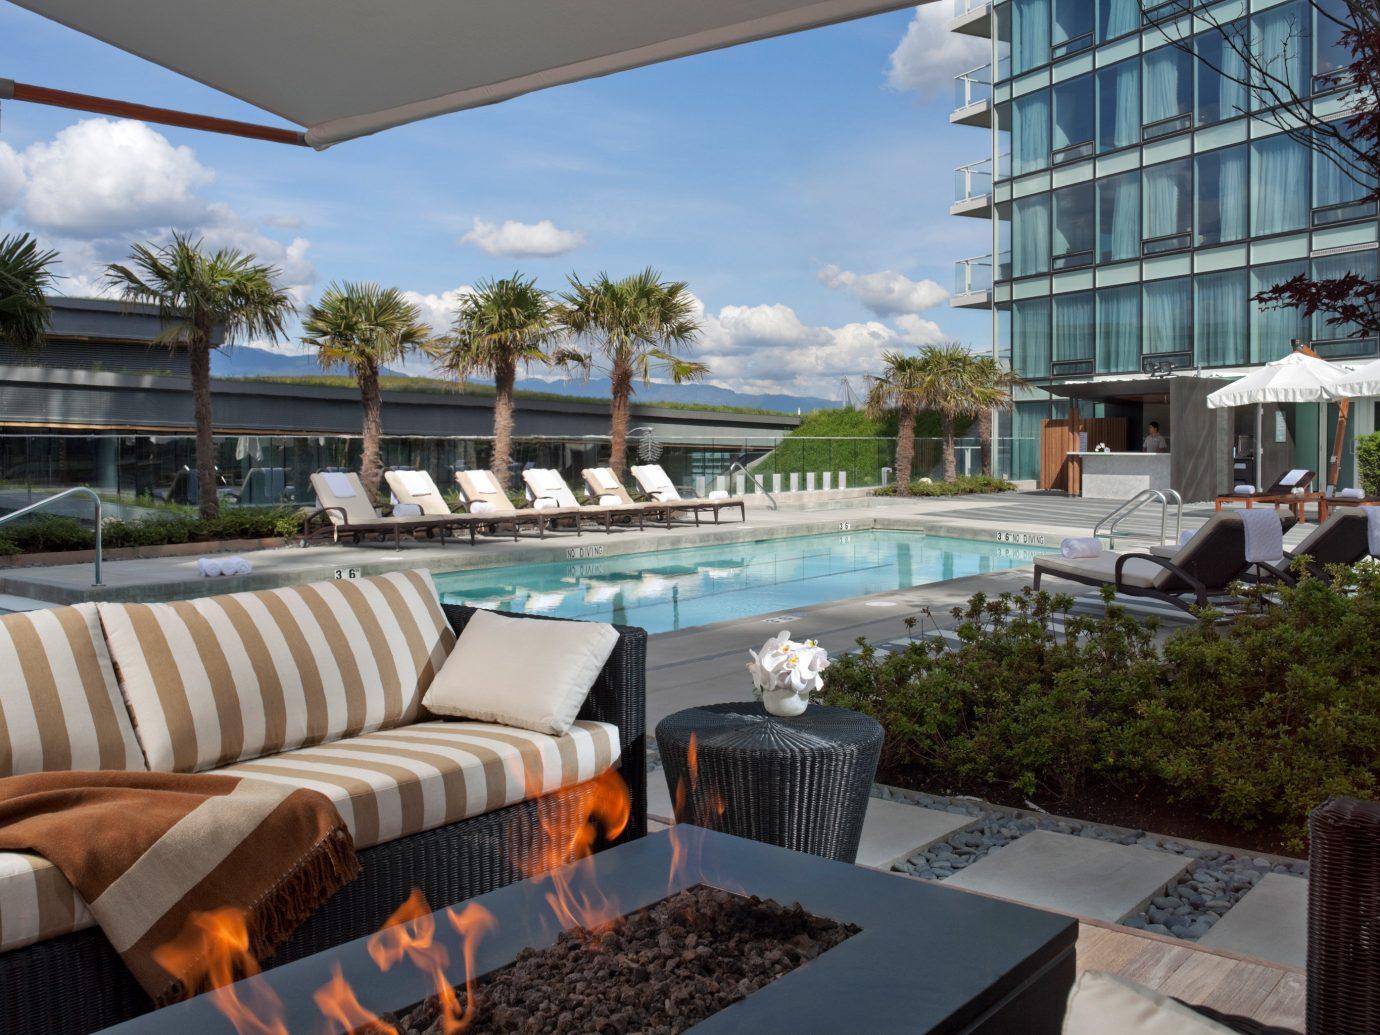 Exterior Hotels Lounge Pool property condominium swimming pool estate Resort Villa home real estate backyard apartment area furniture overlooking set